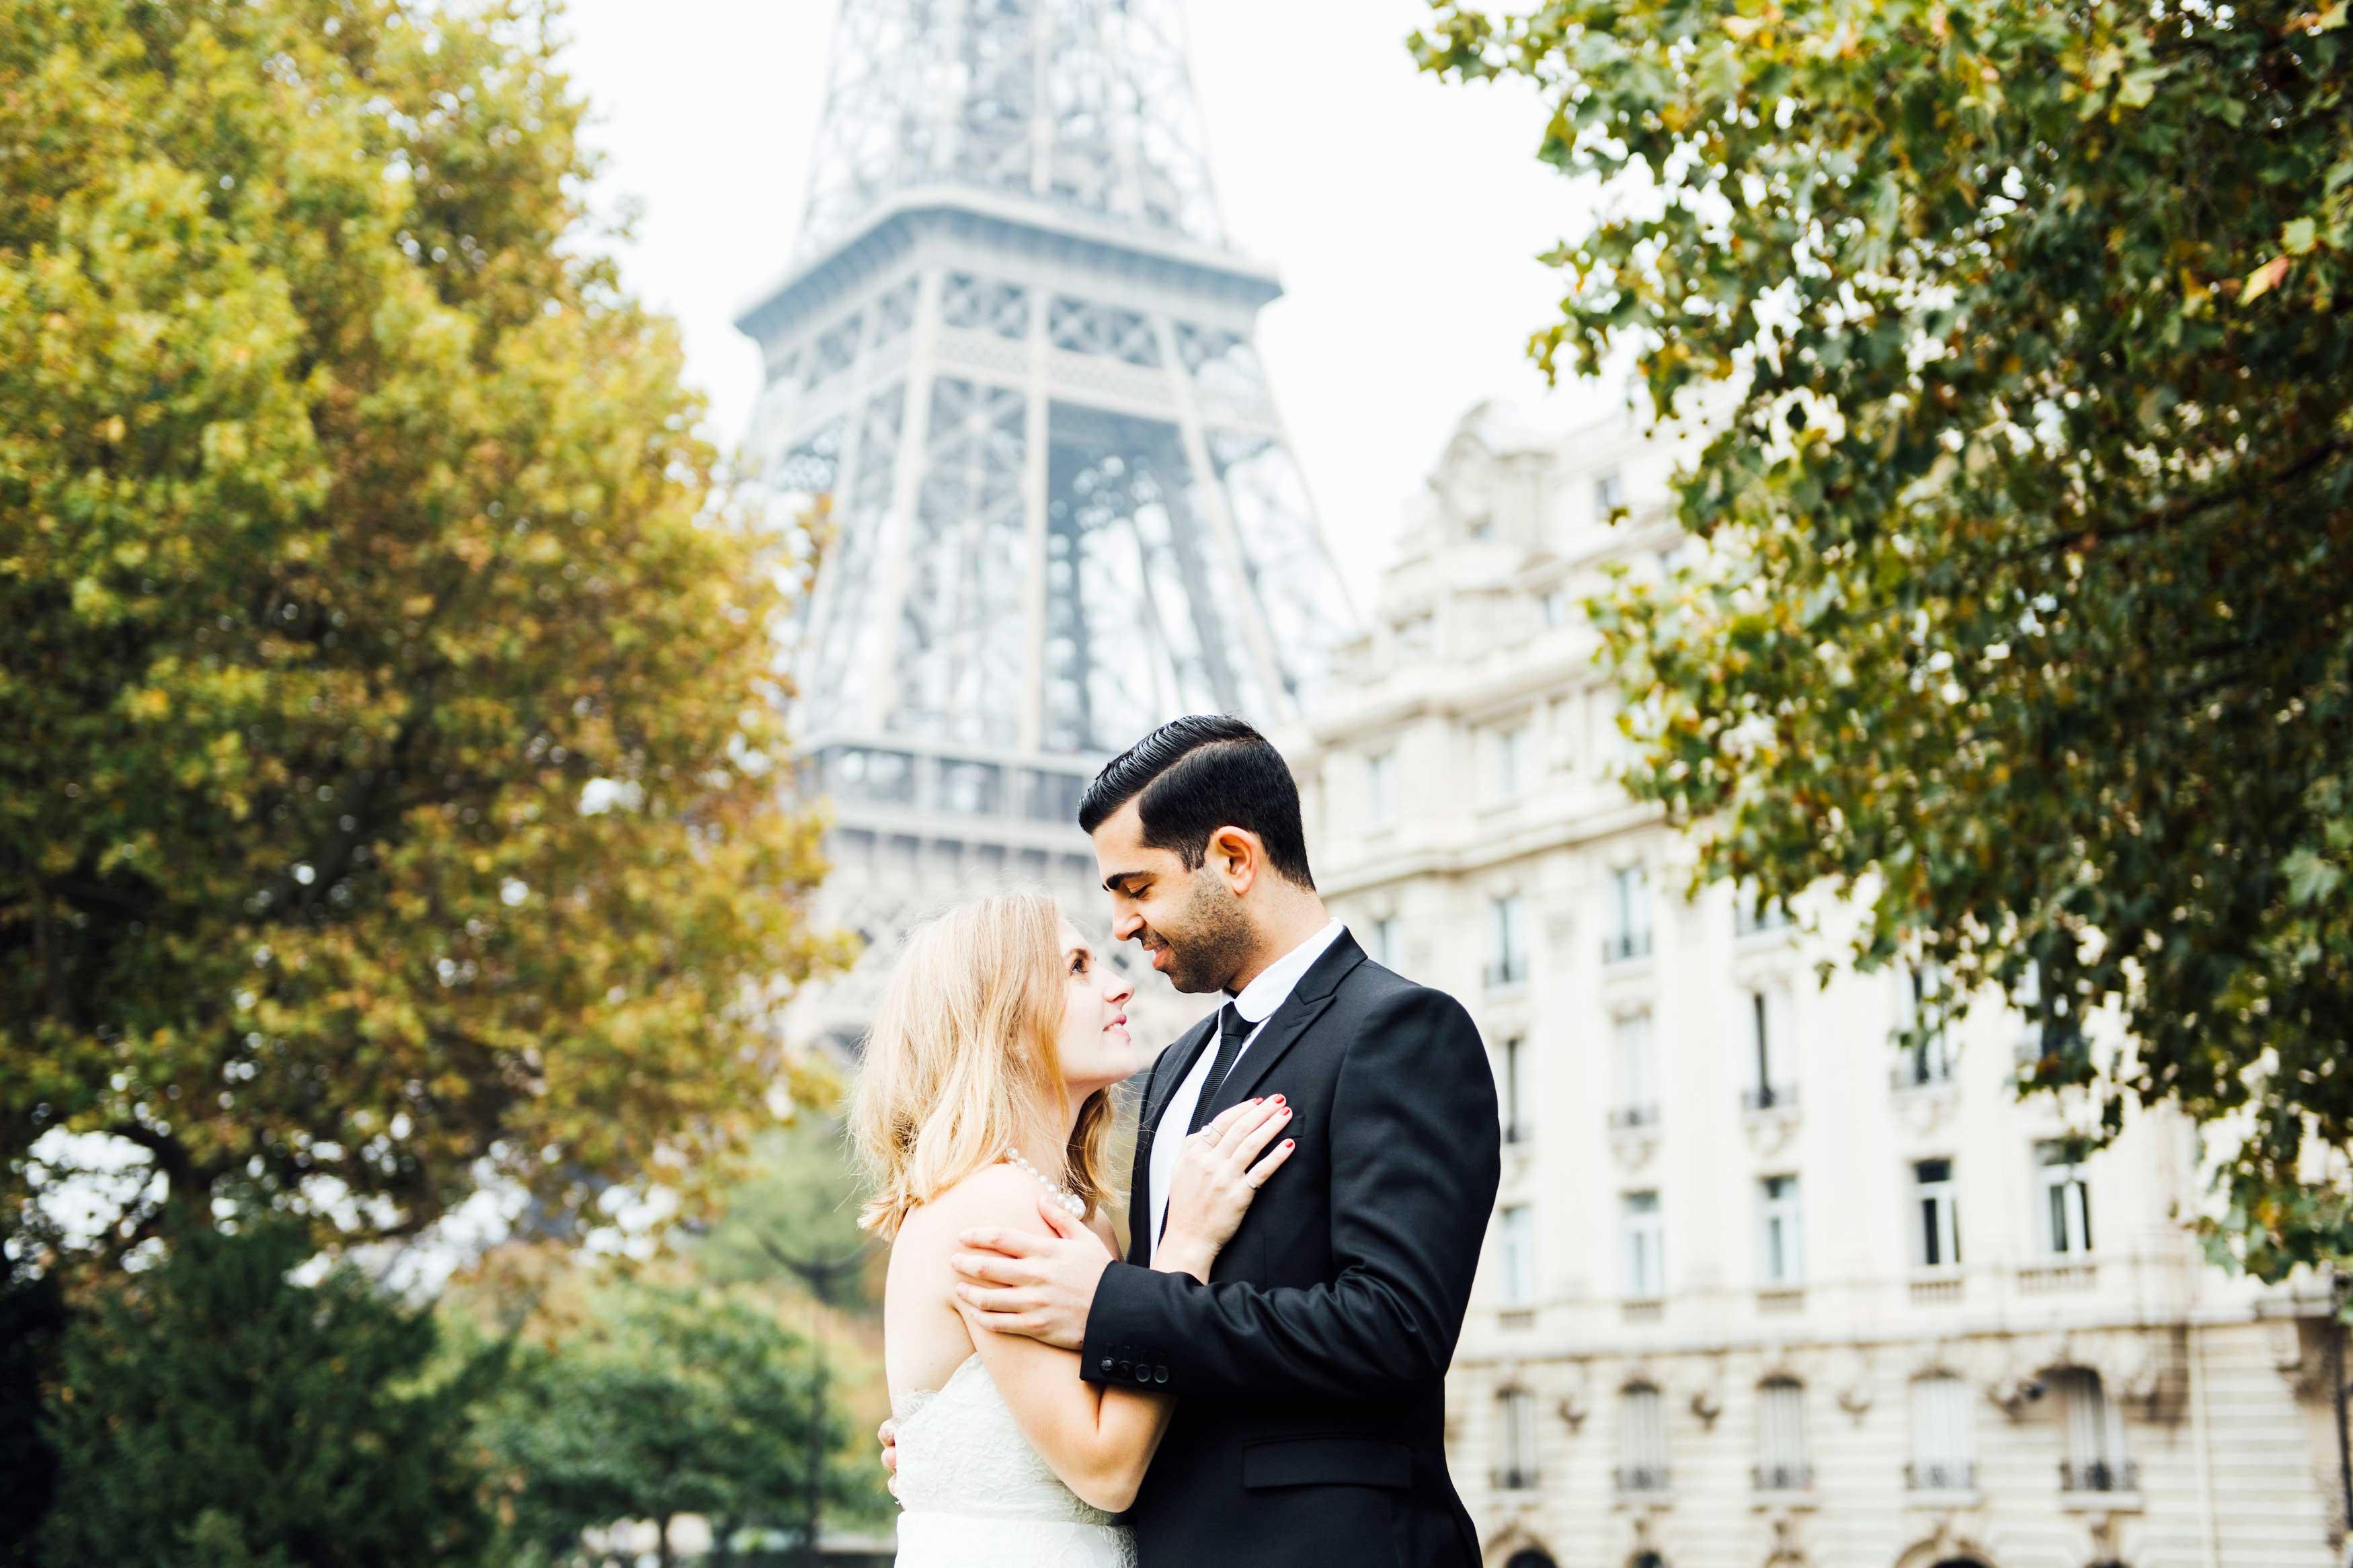 Sabrina Dahan romantic engagement photo in Paris